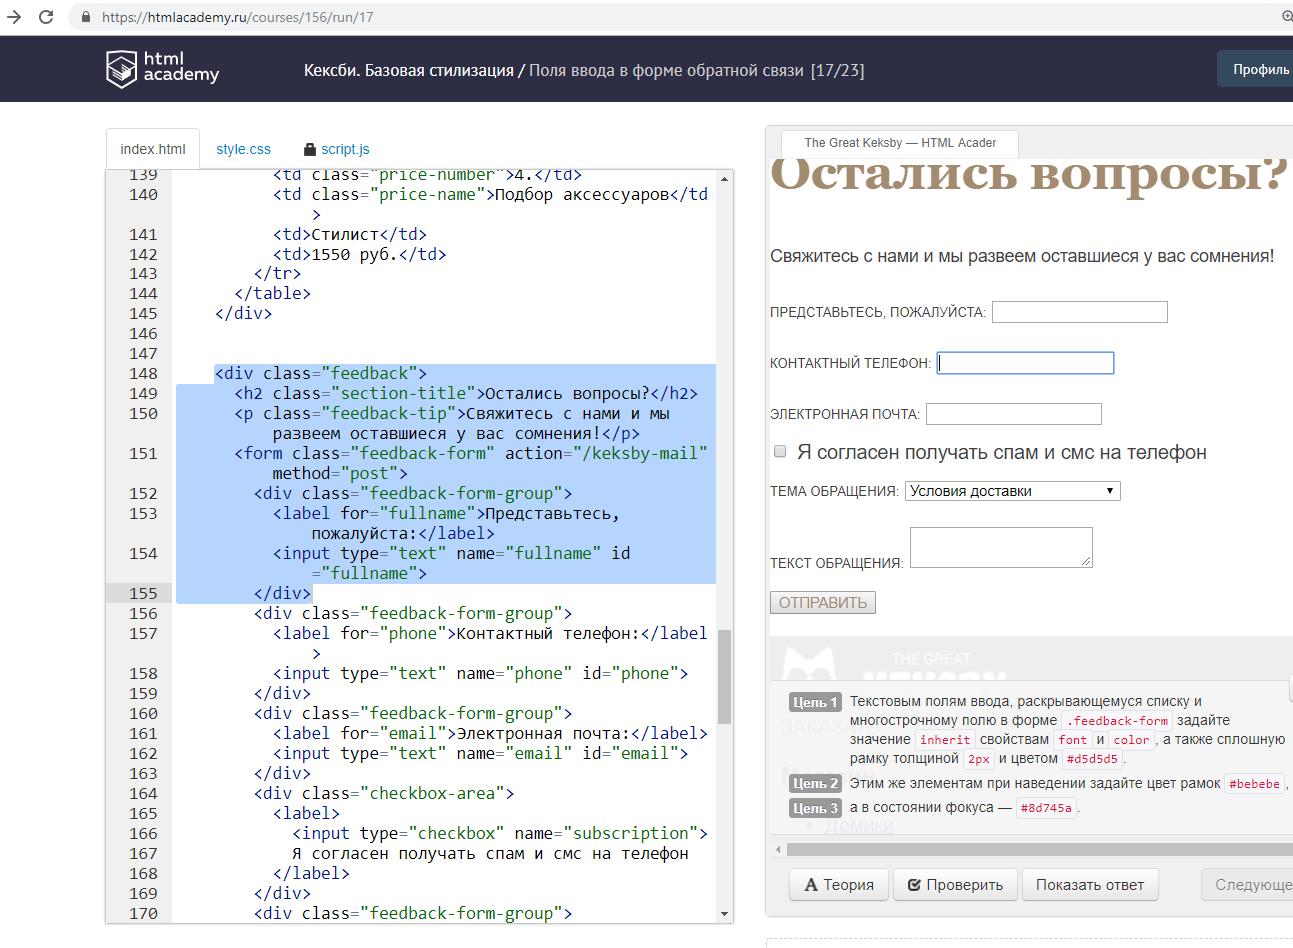 Кексби  Базовая стилизация 17/23 - Курсы - Сообщество HTML